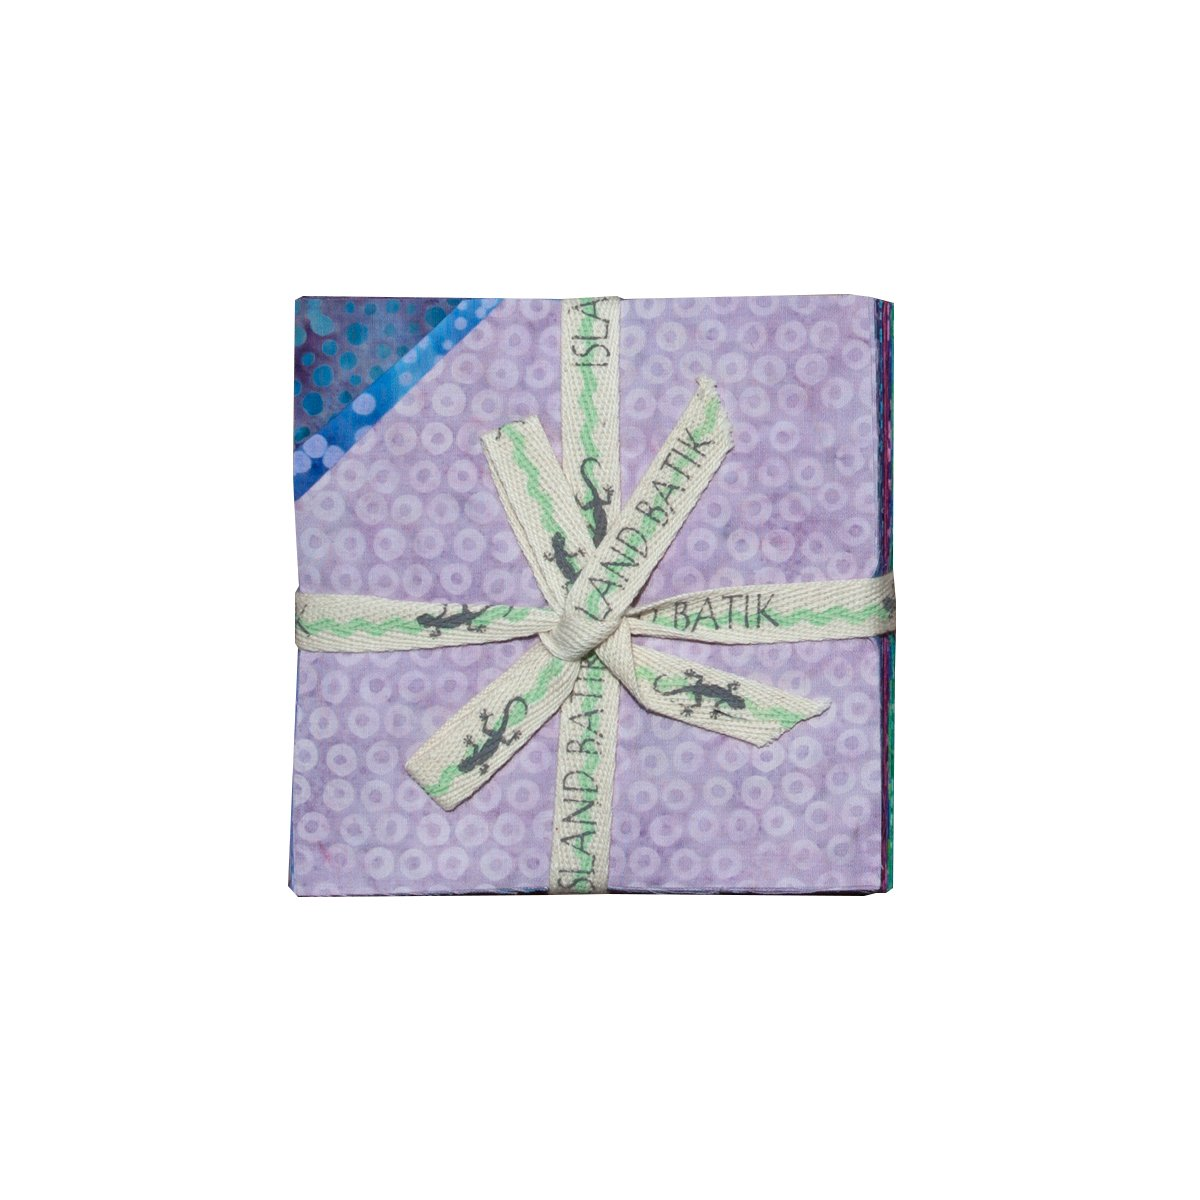 Wind Dotalicious Stamps Batik